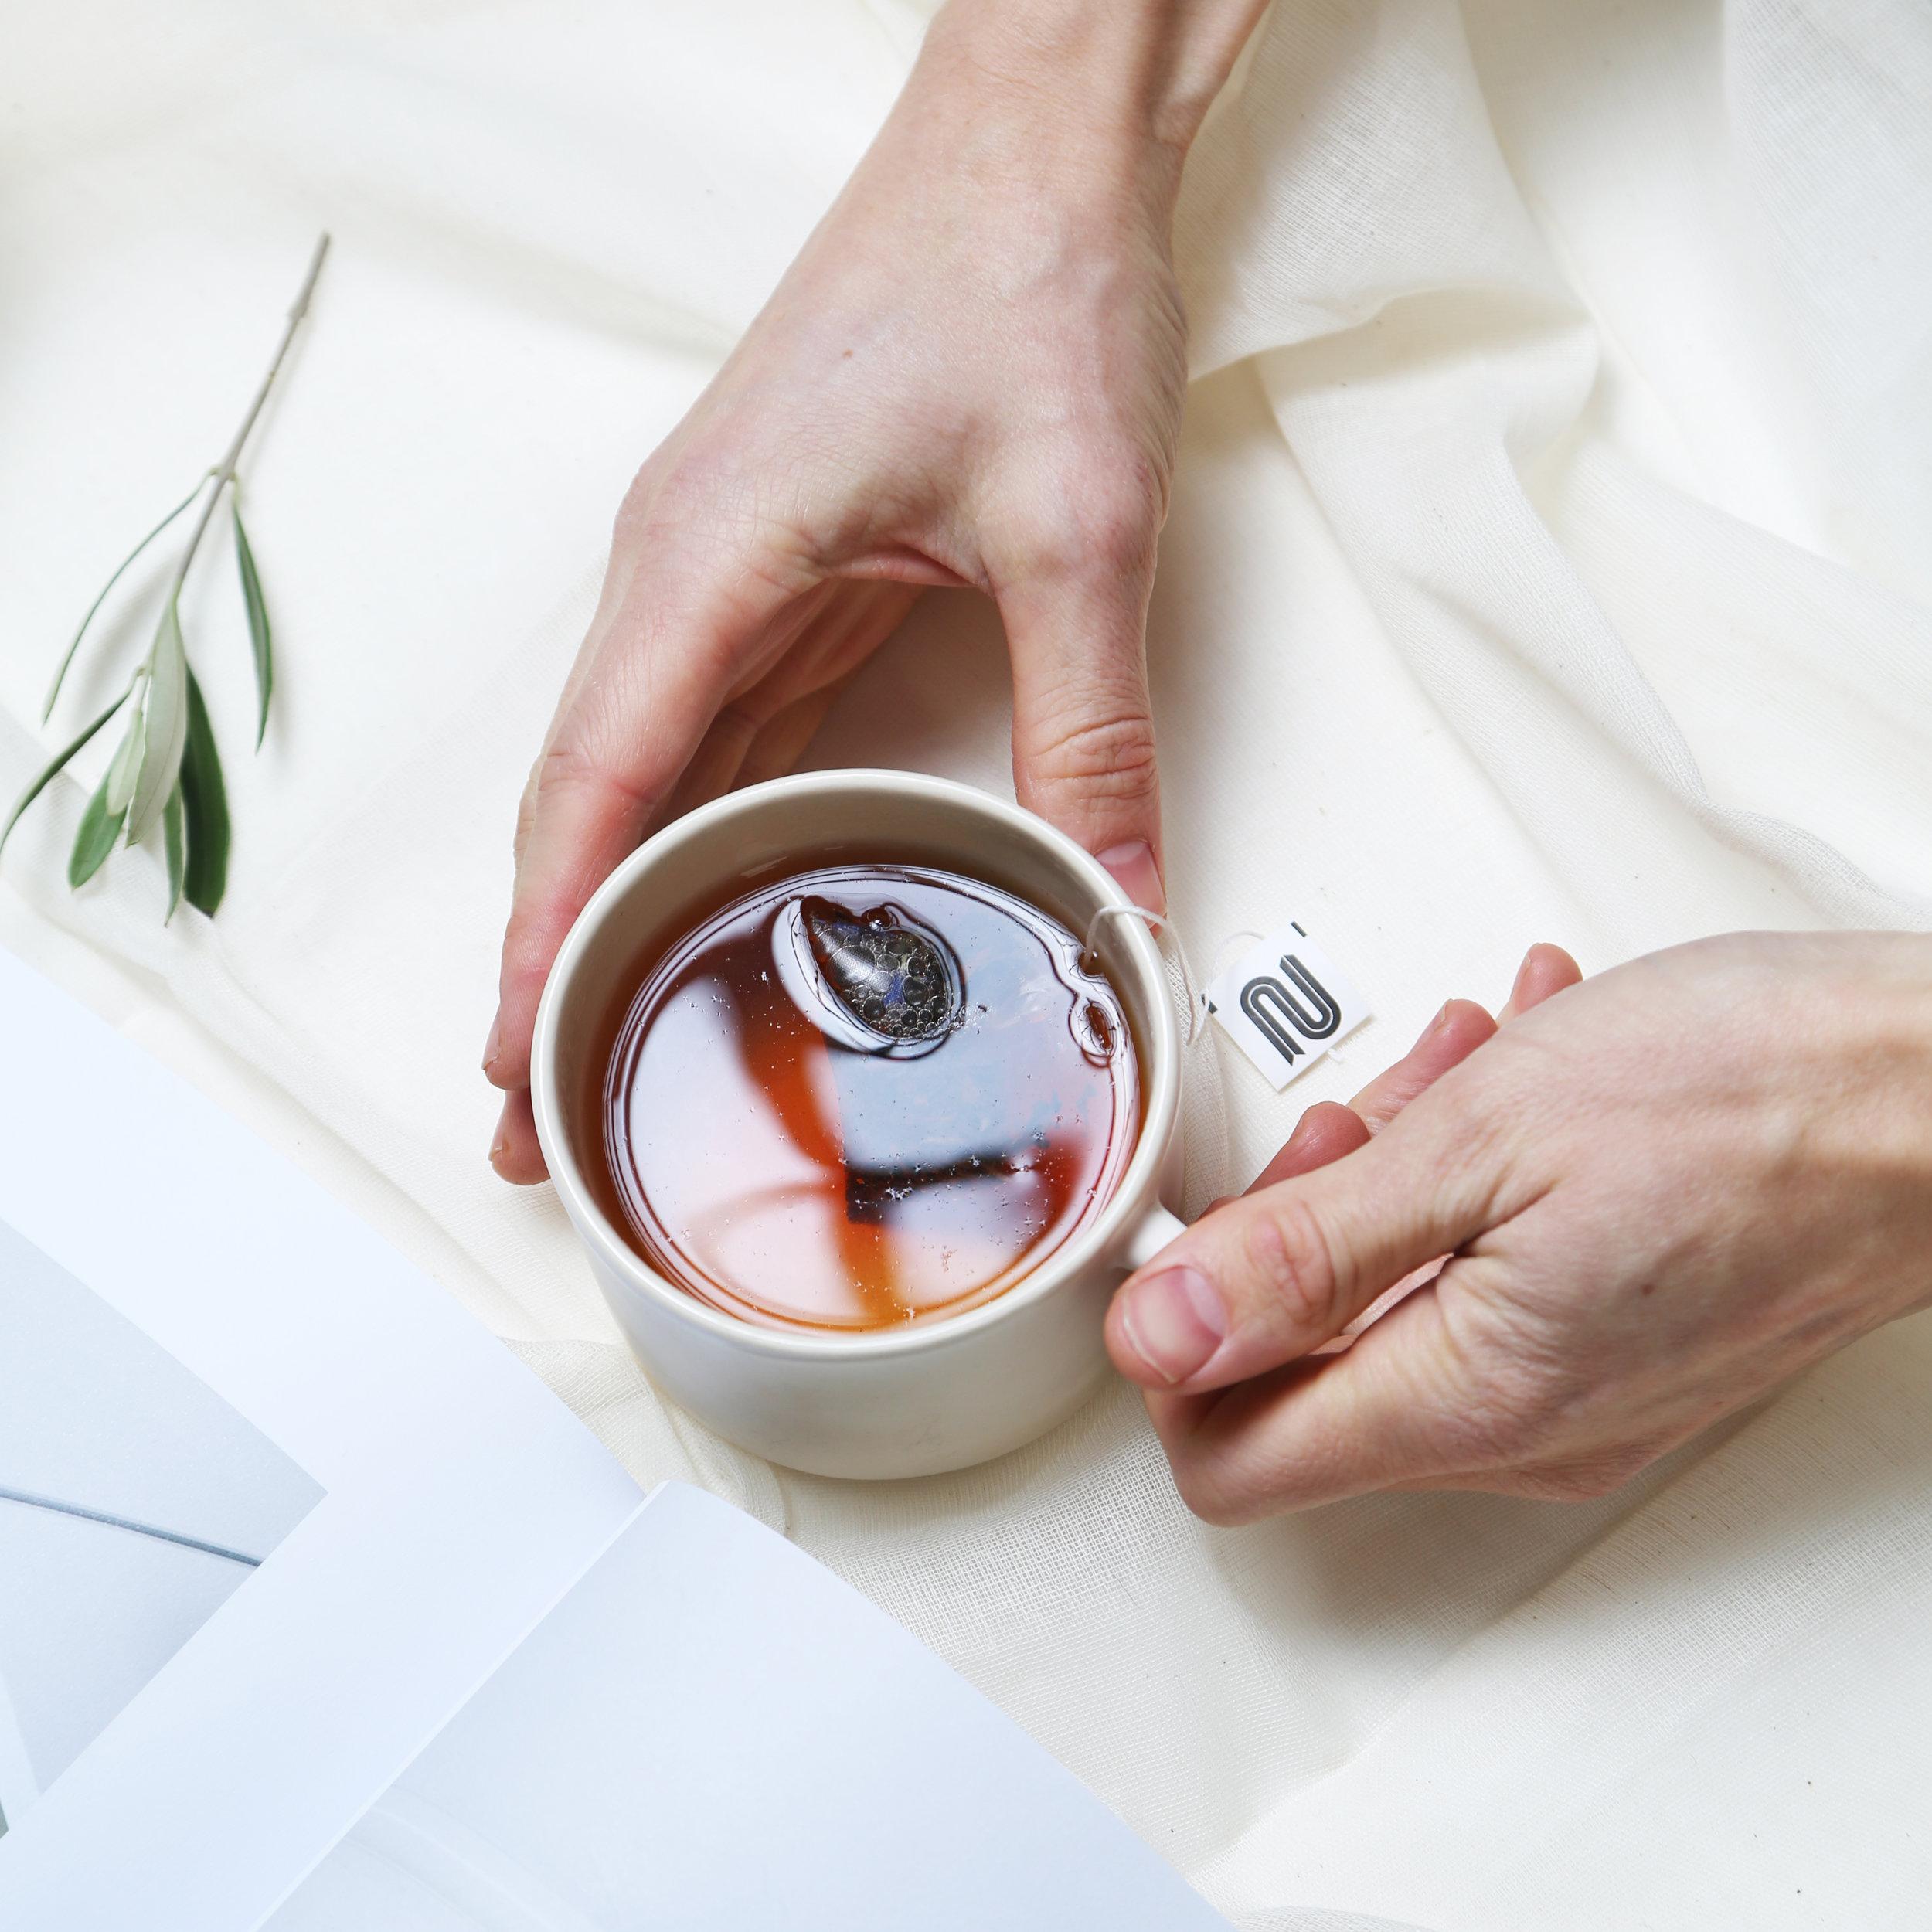 English Breakfast teabag